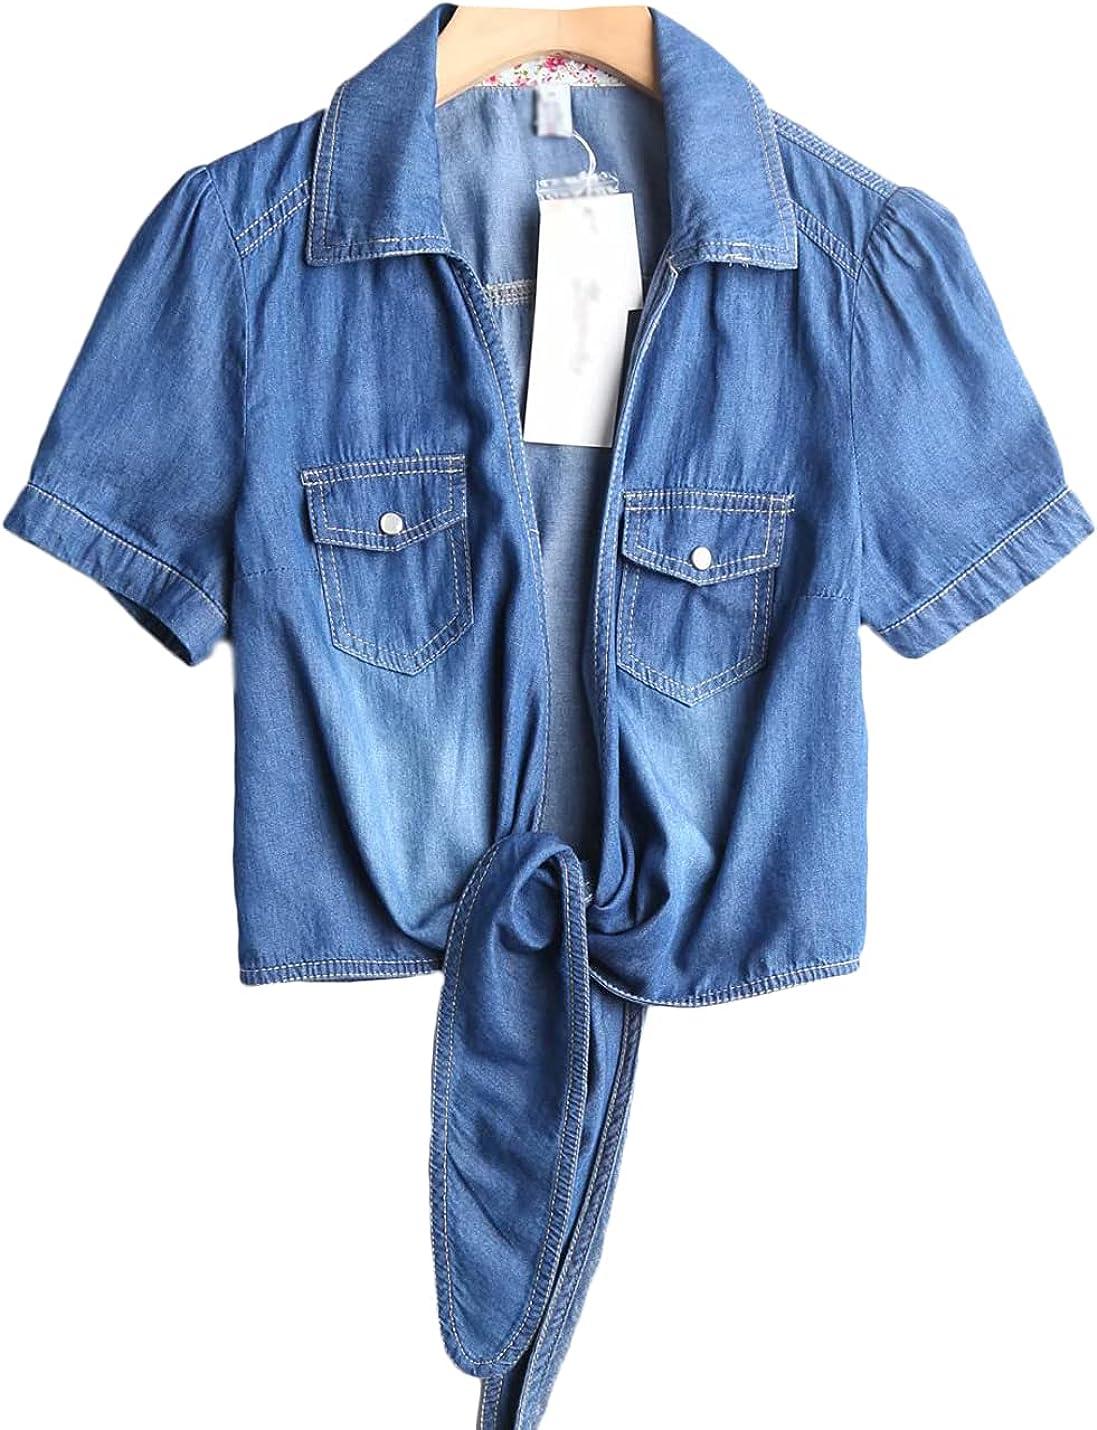 Jenkoon Women's Casual Short Sleeve Denim Shirt Open Front Knotted Shrugs Cardigan Crop Tops